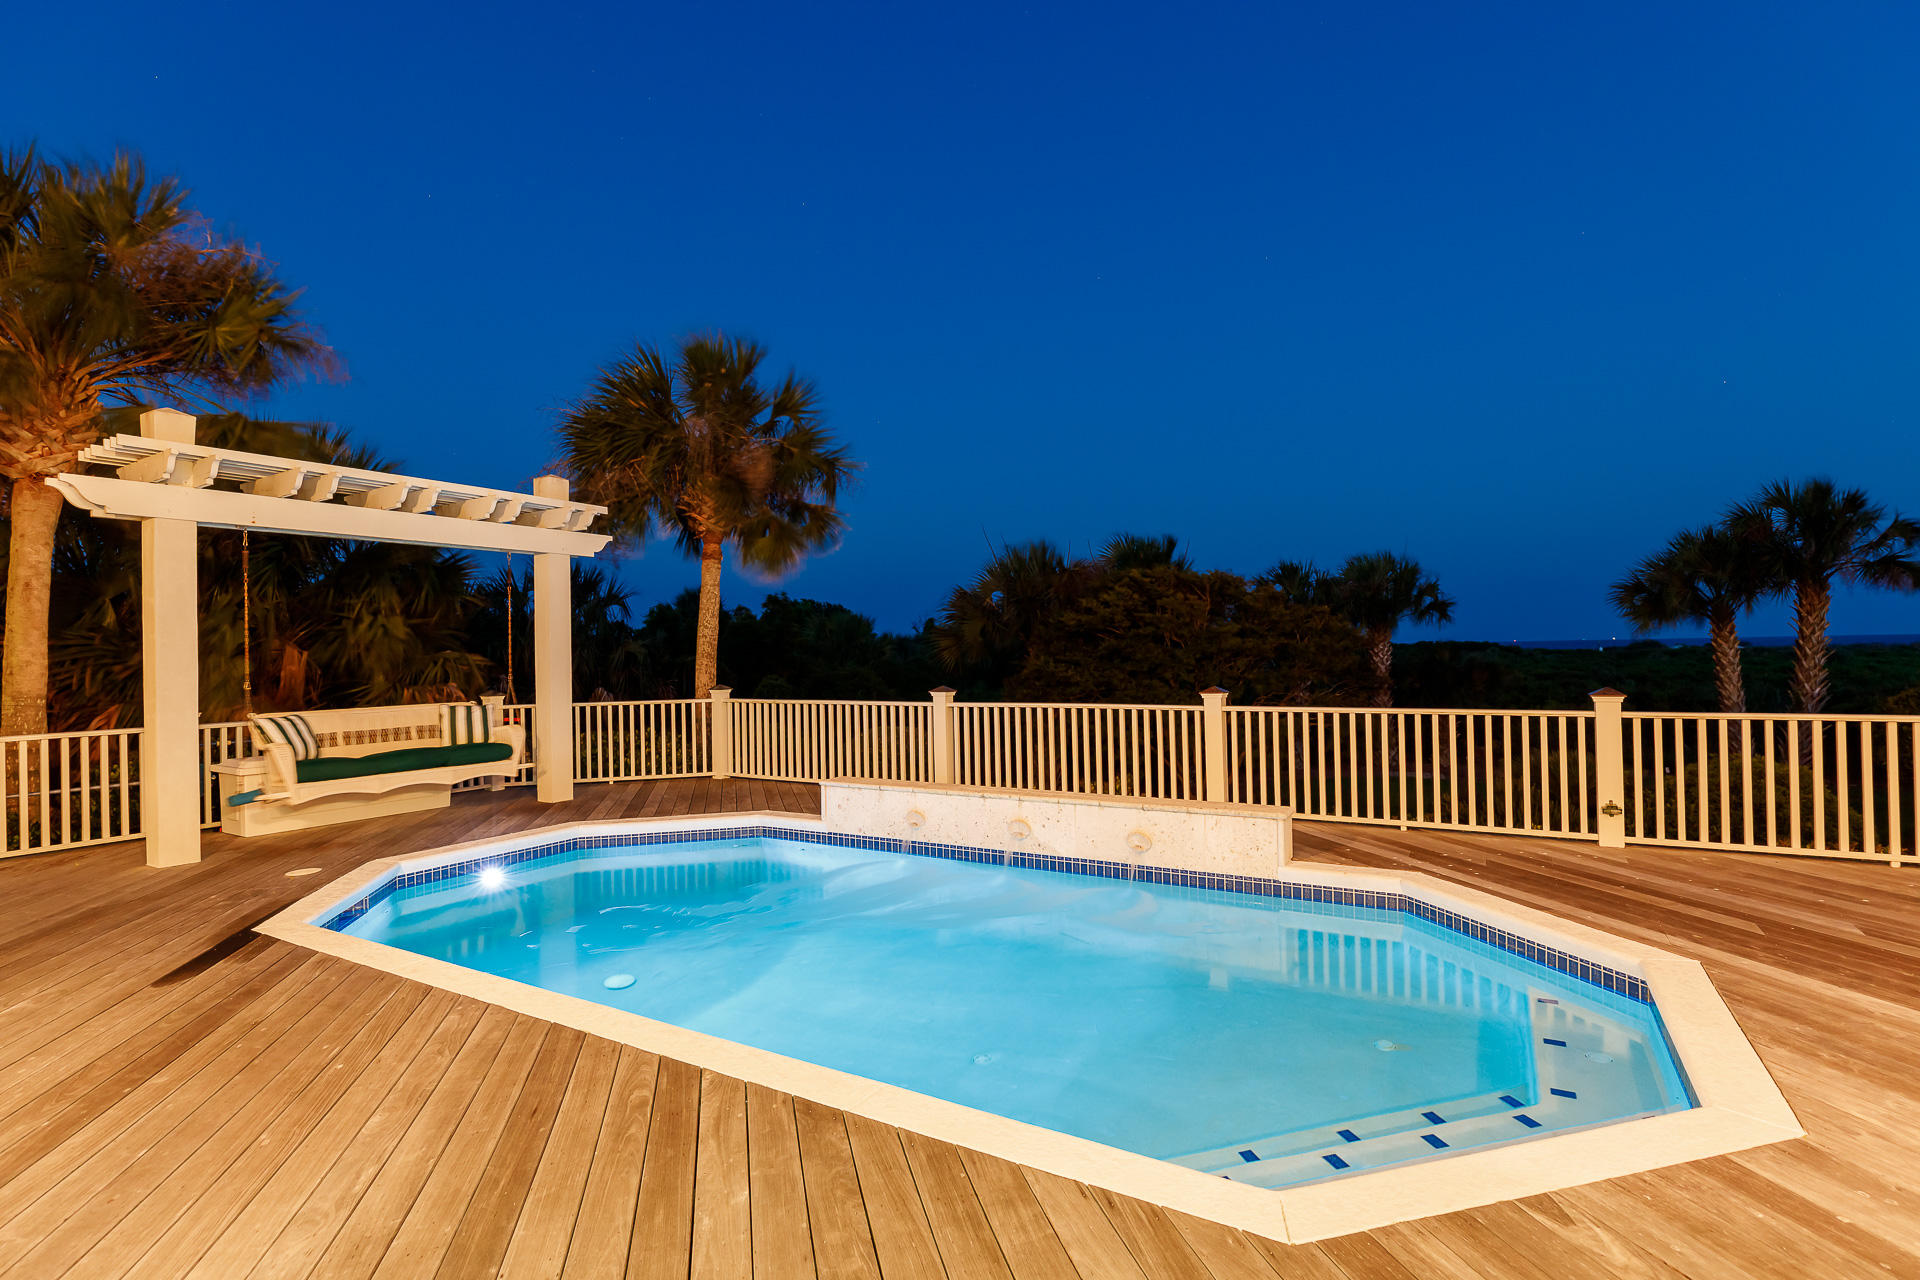 Seabrook Island Homes For Sale - 2216 Rolling Dune, Seabrook Island, SC - 61